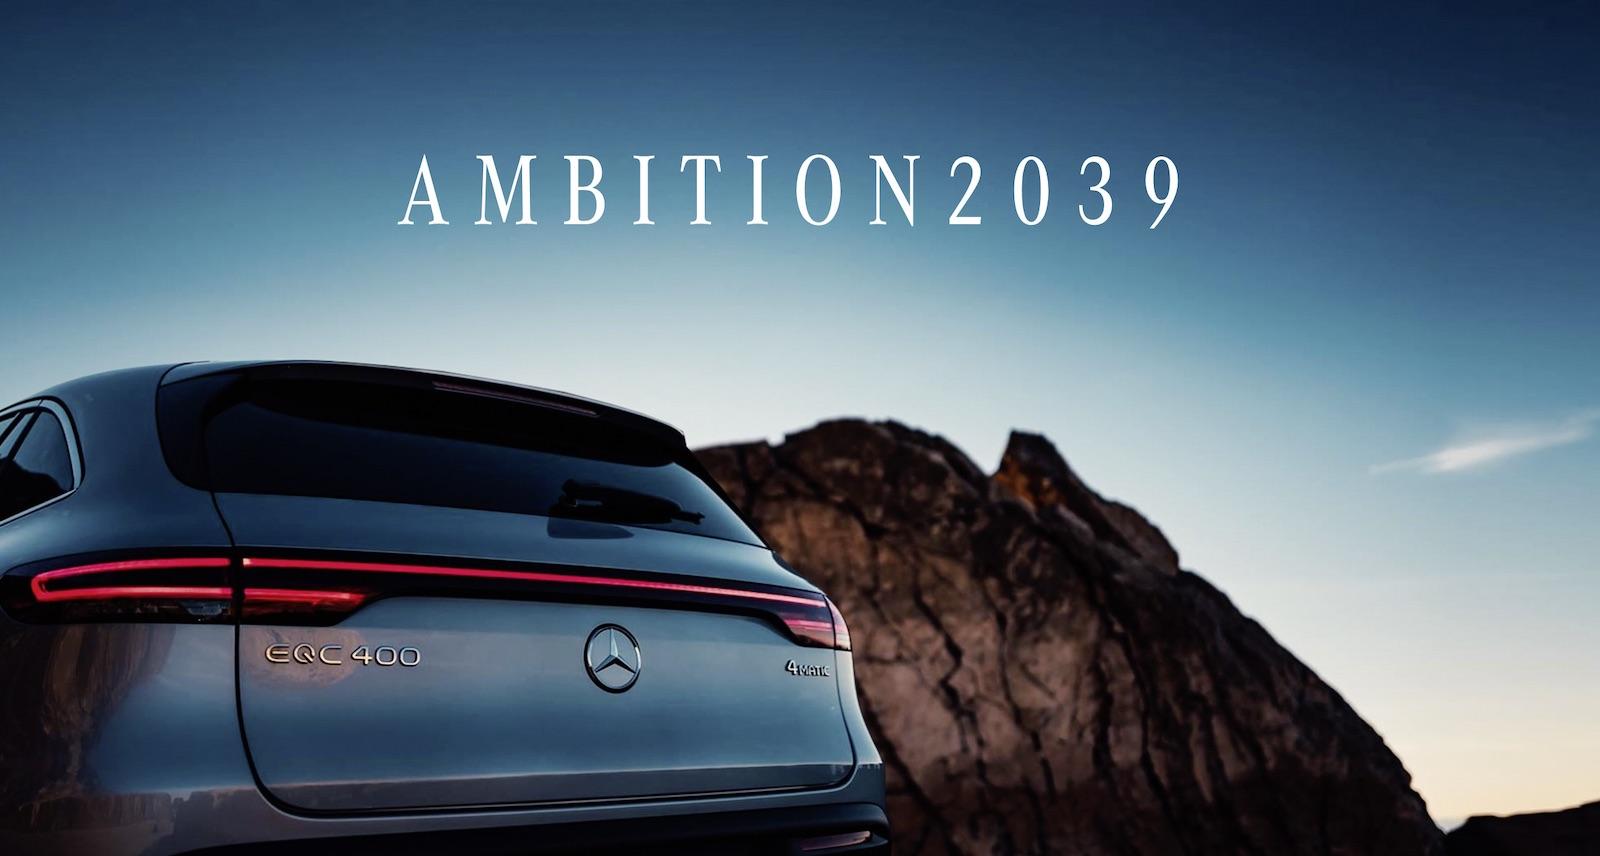 Damiler-Ambition-2039